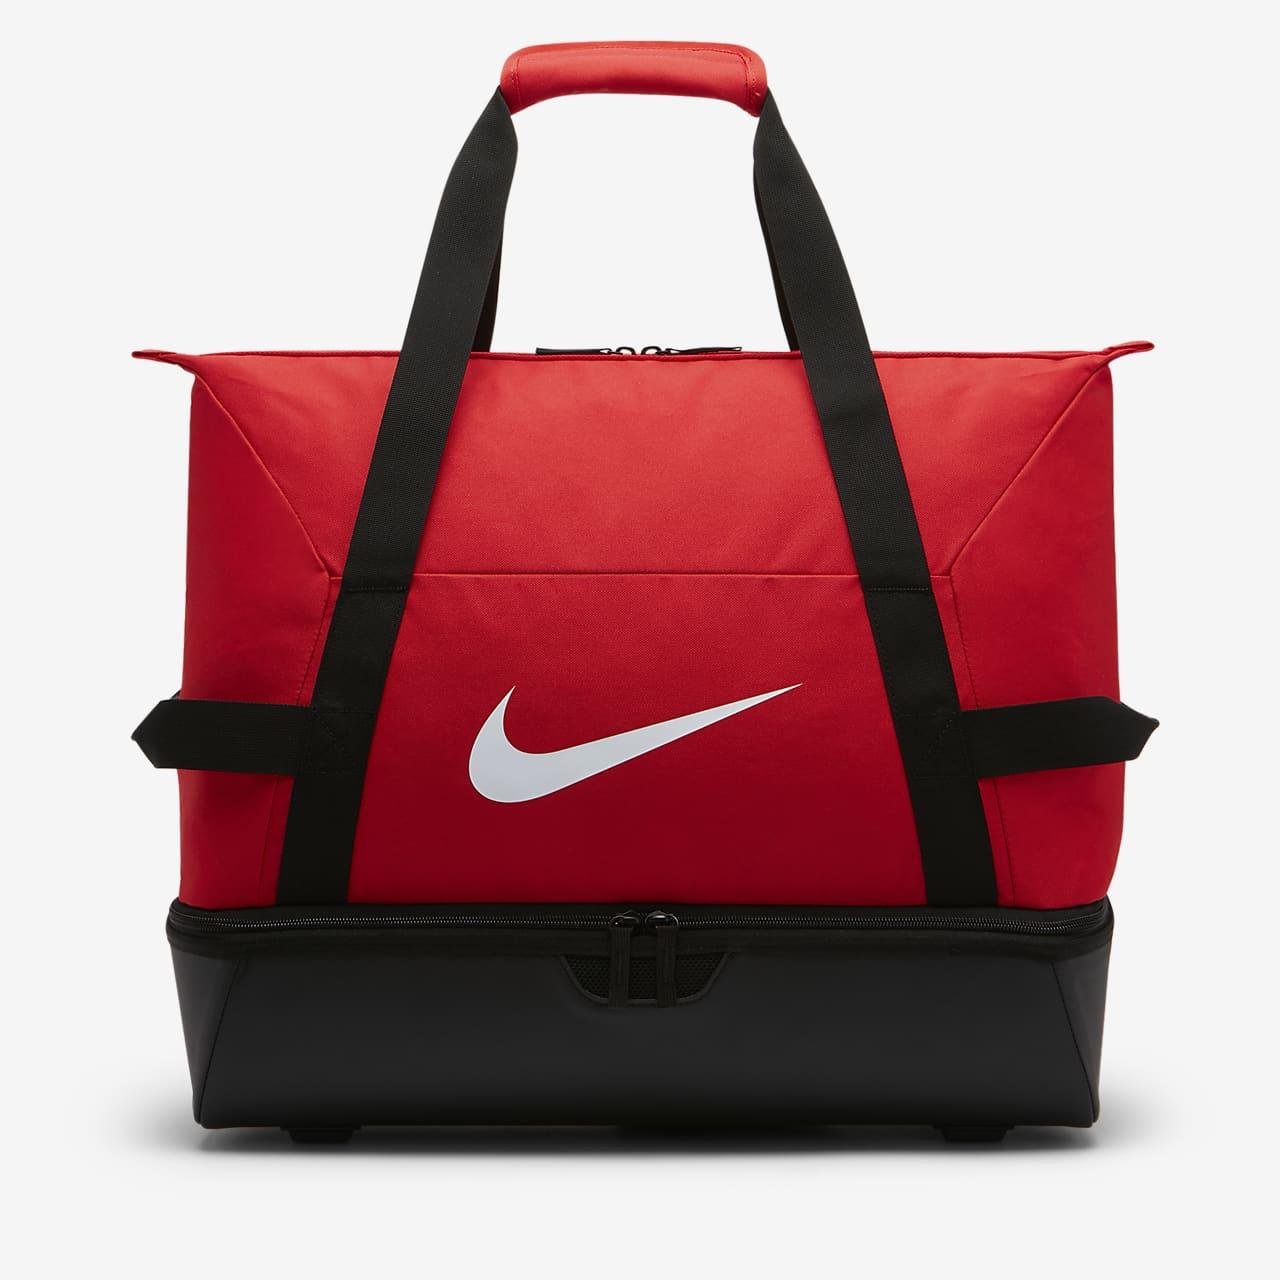 Borsone grande da calcio Nike Academy Team Hardcase